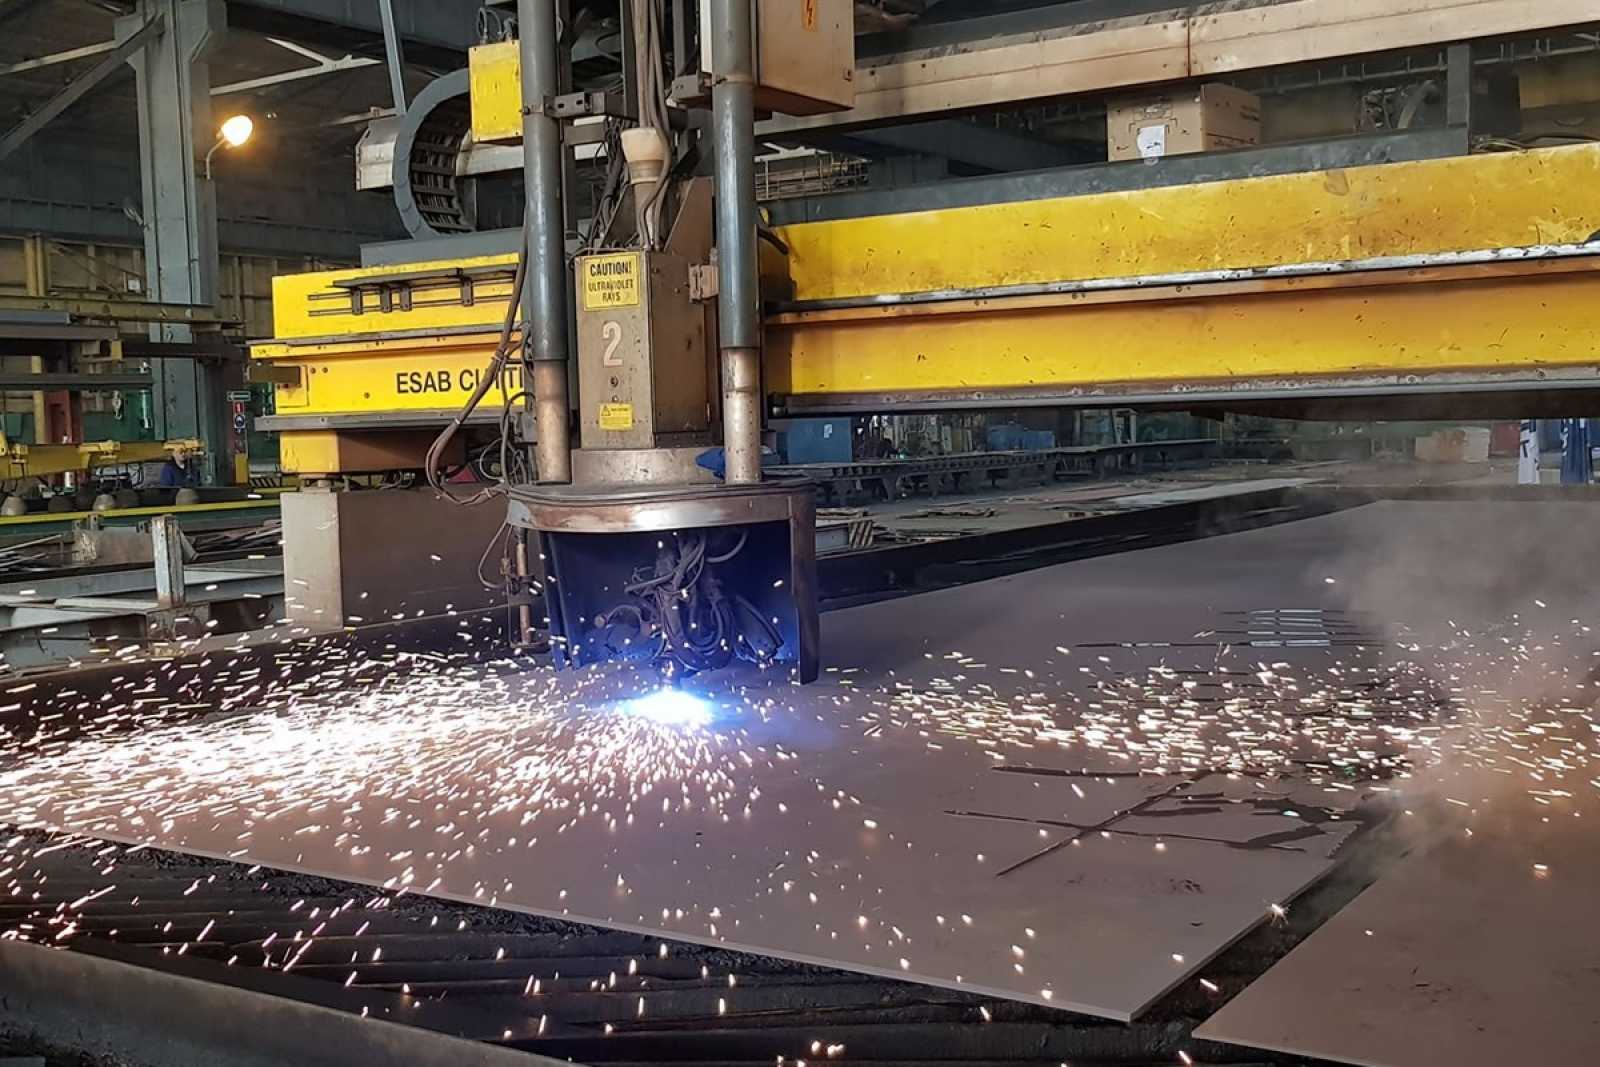 Stell cutting